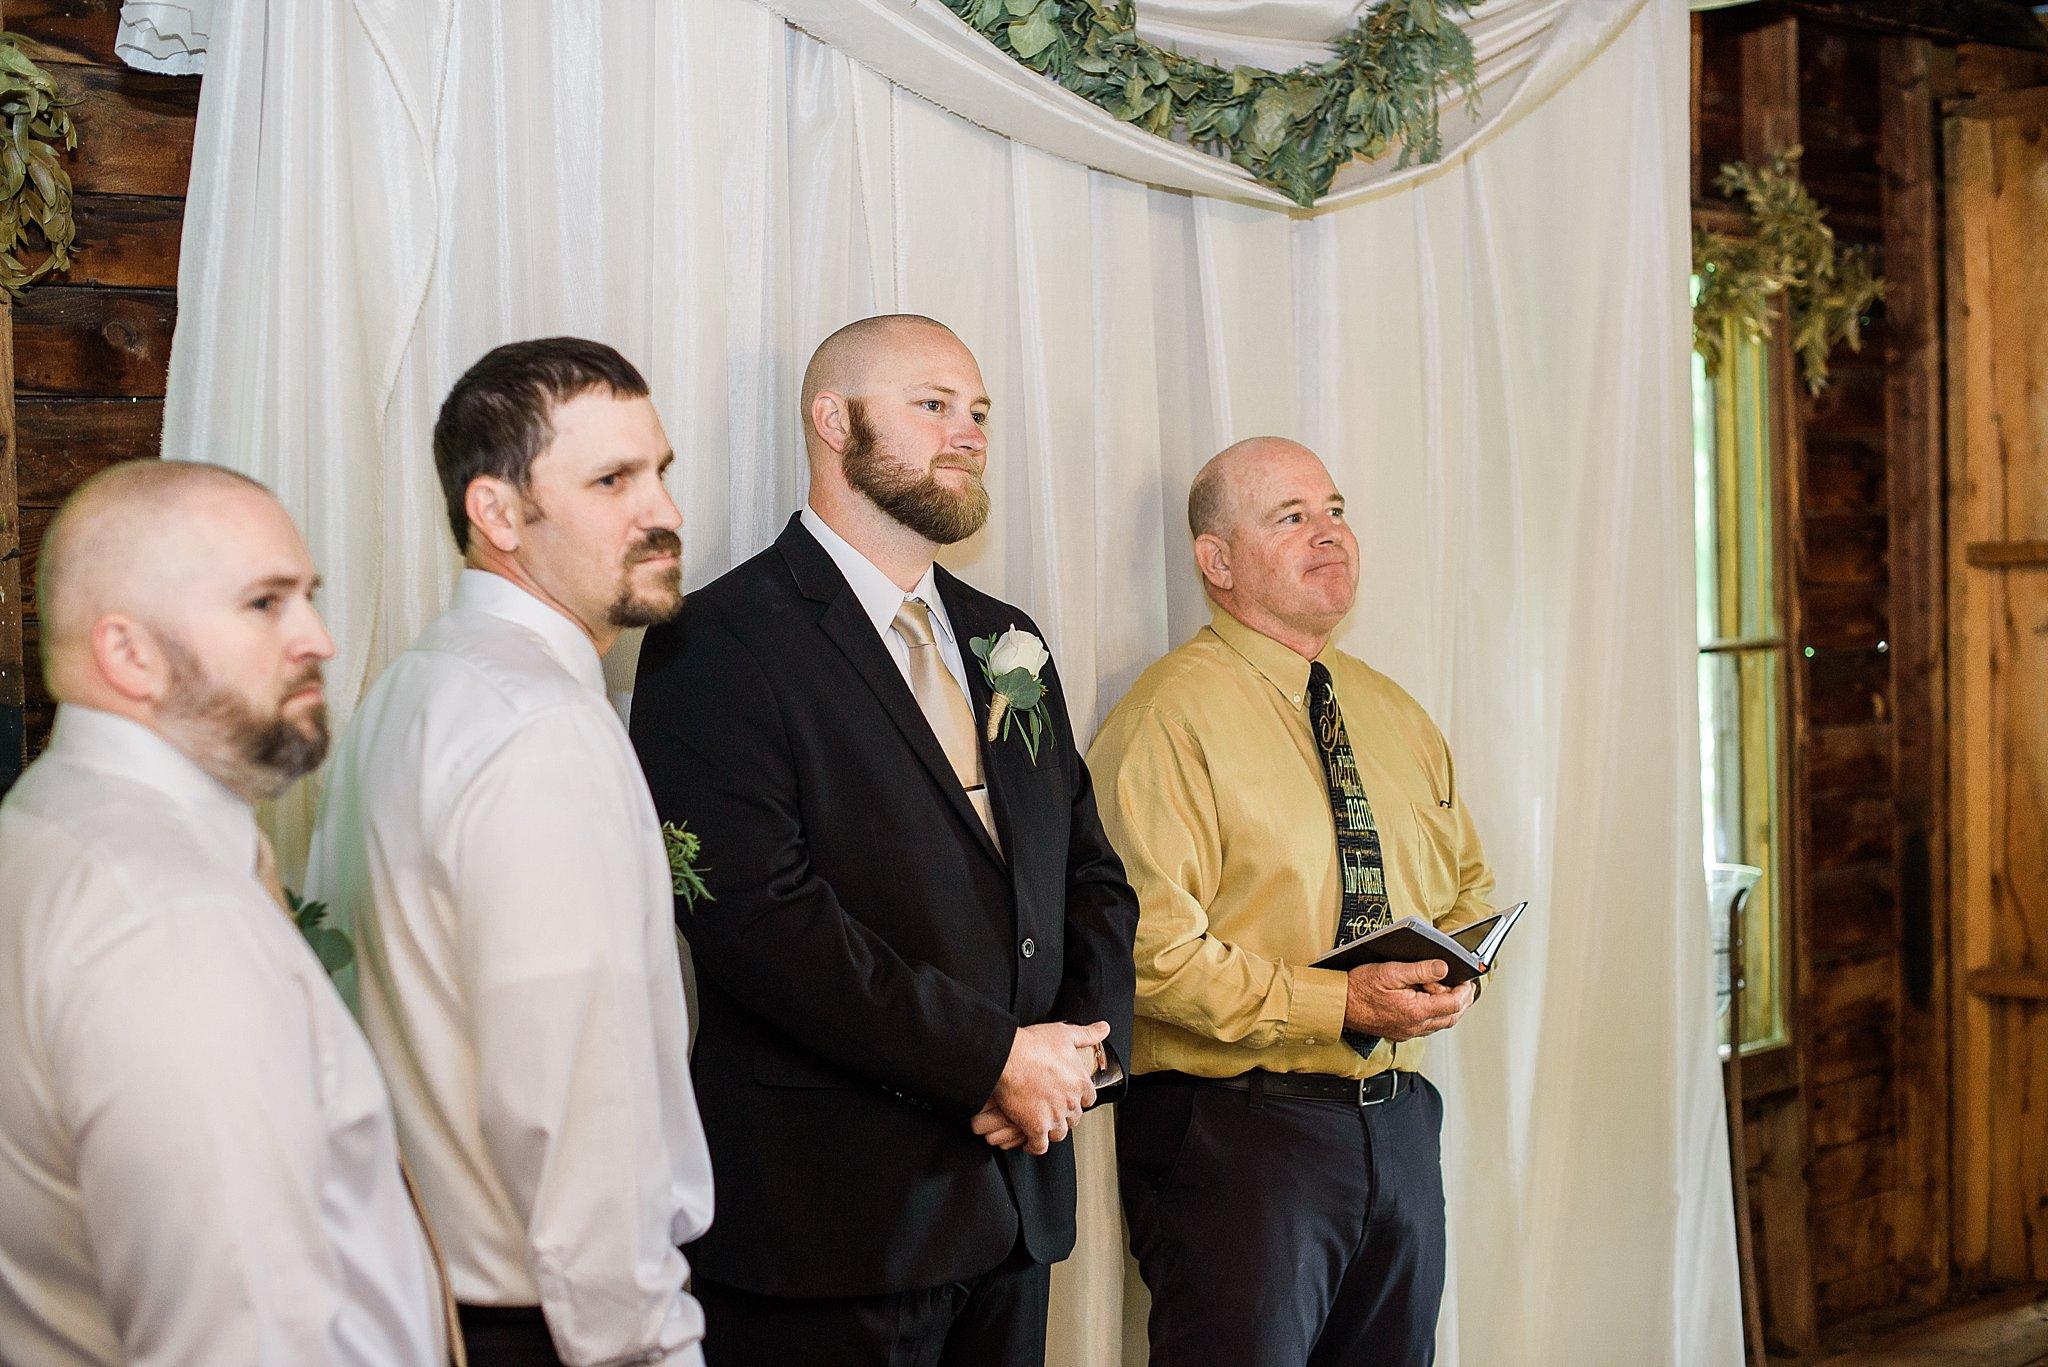 Preserve at Chocorua Tamworth NH Wedding May Wedding New Hampshire Wedding 93.jpg